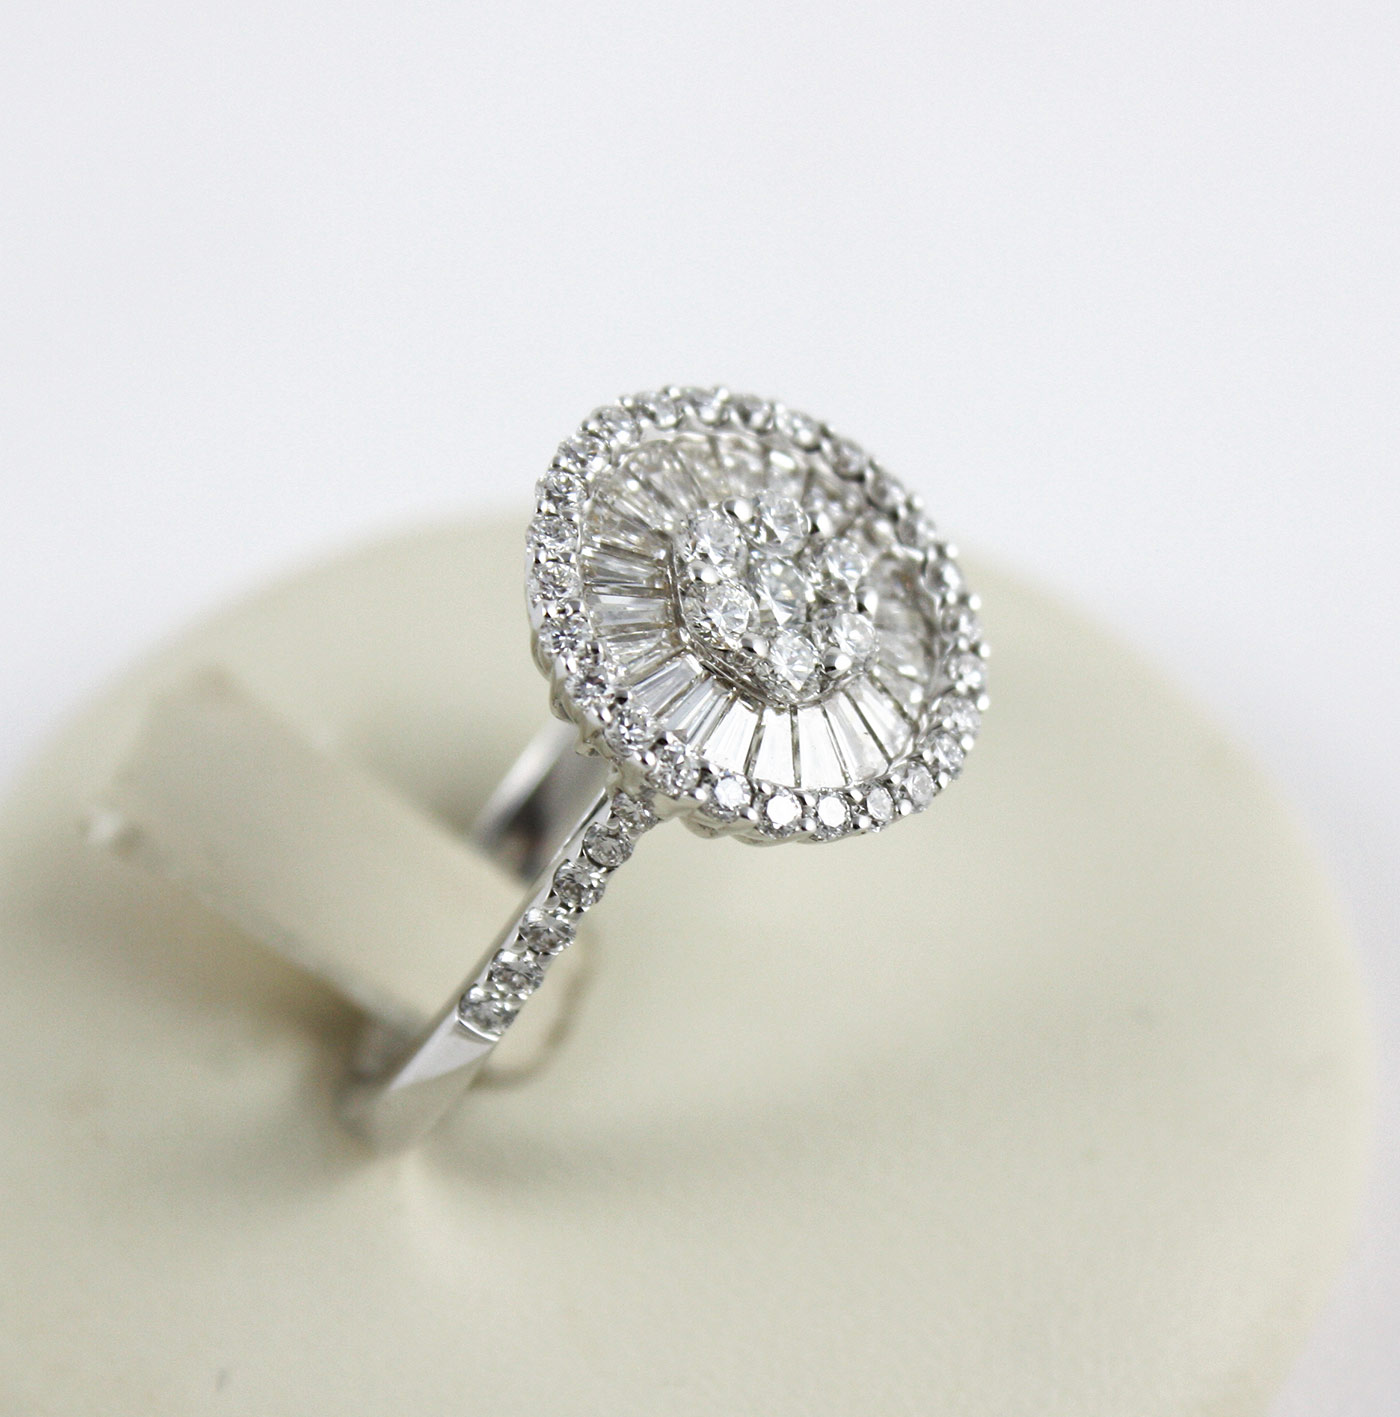 Diamante dating UK